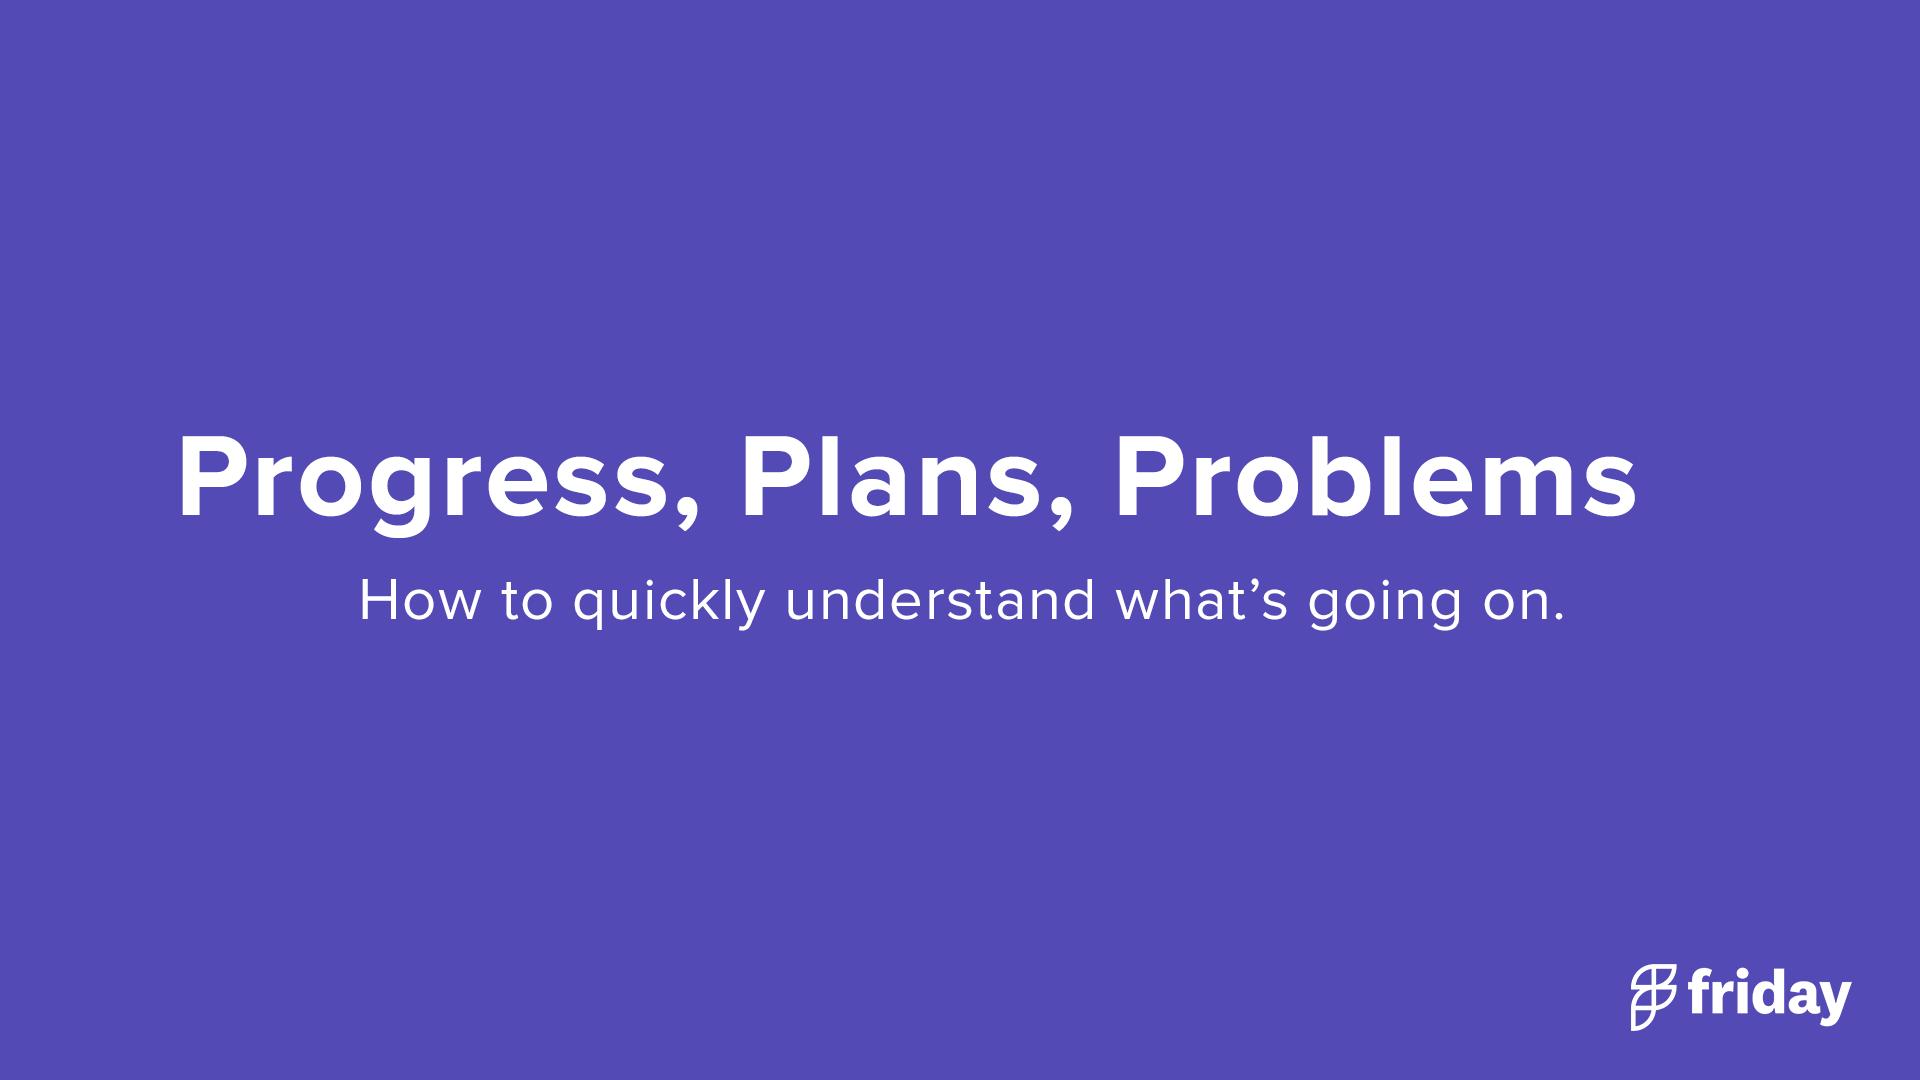 Progress, Plans, Problems